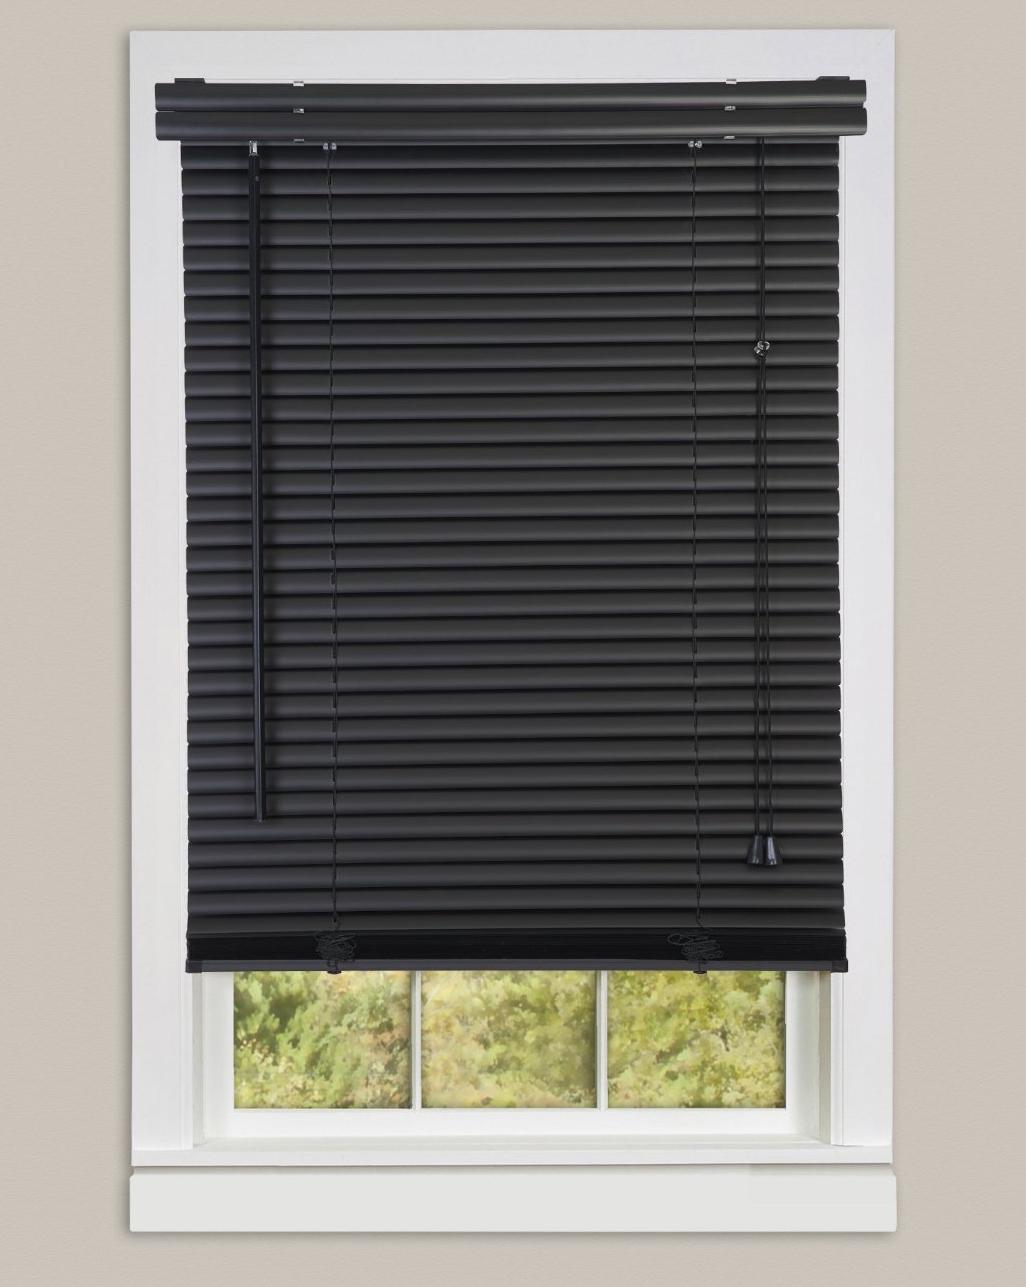 window blind window blinds mini blinds 1 QRYIDFZ